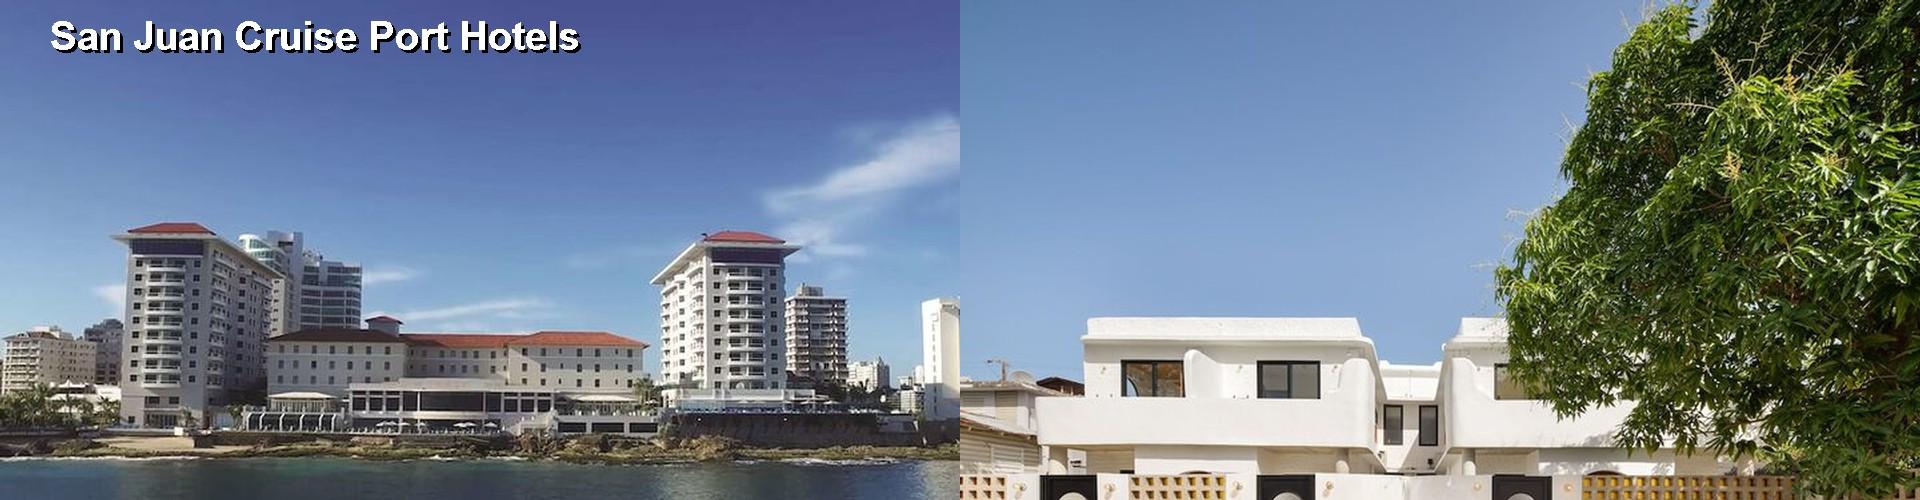 $67+ Hotels Near San Juan Cruise Port PR